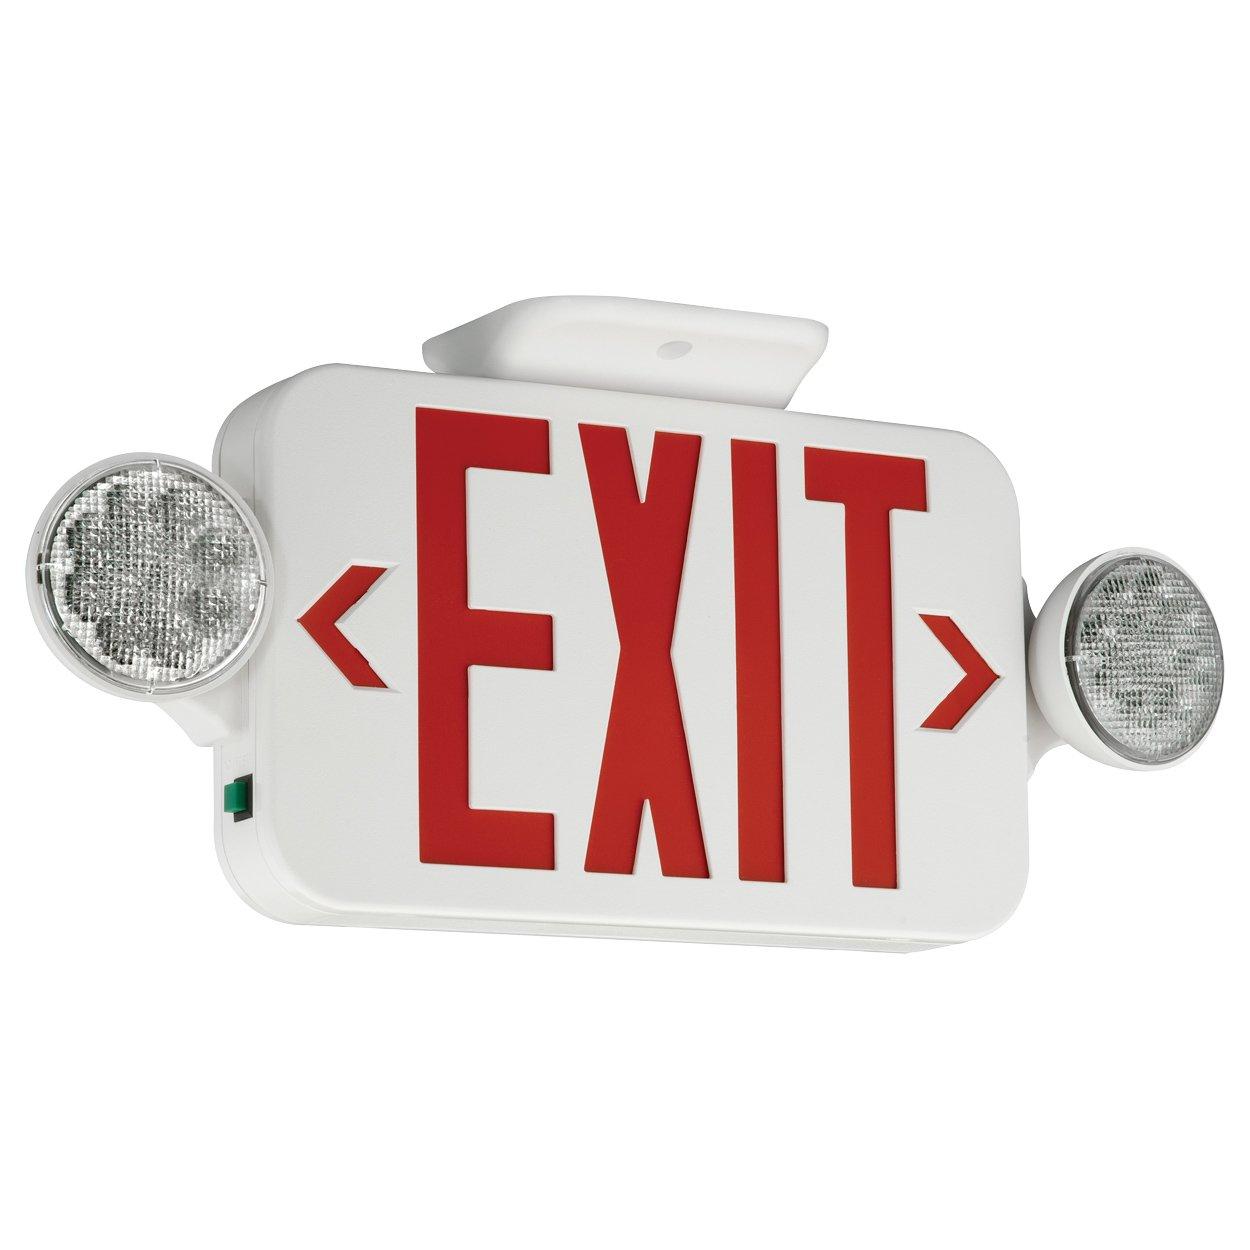 Compass CCRRC EXIT Combo WHT HSG RED LTR RMT Cap, White